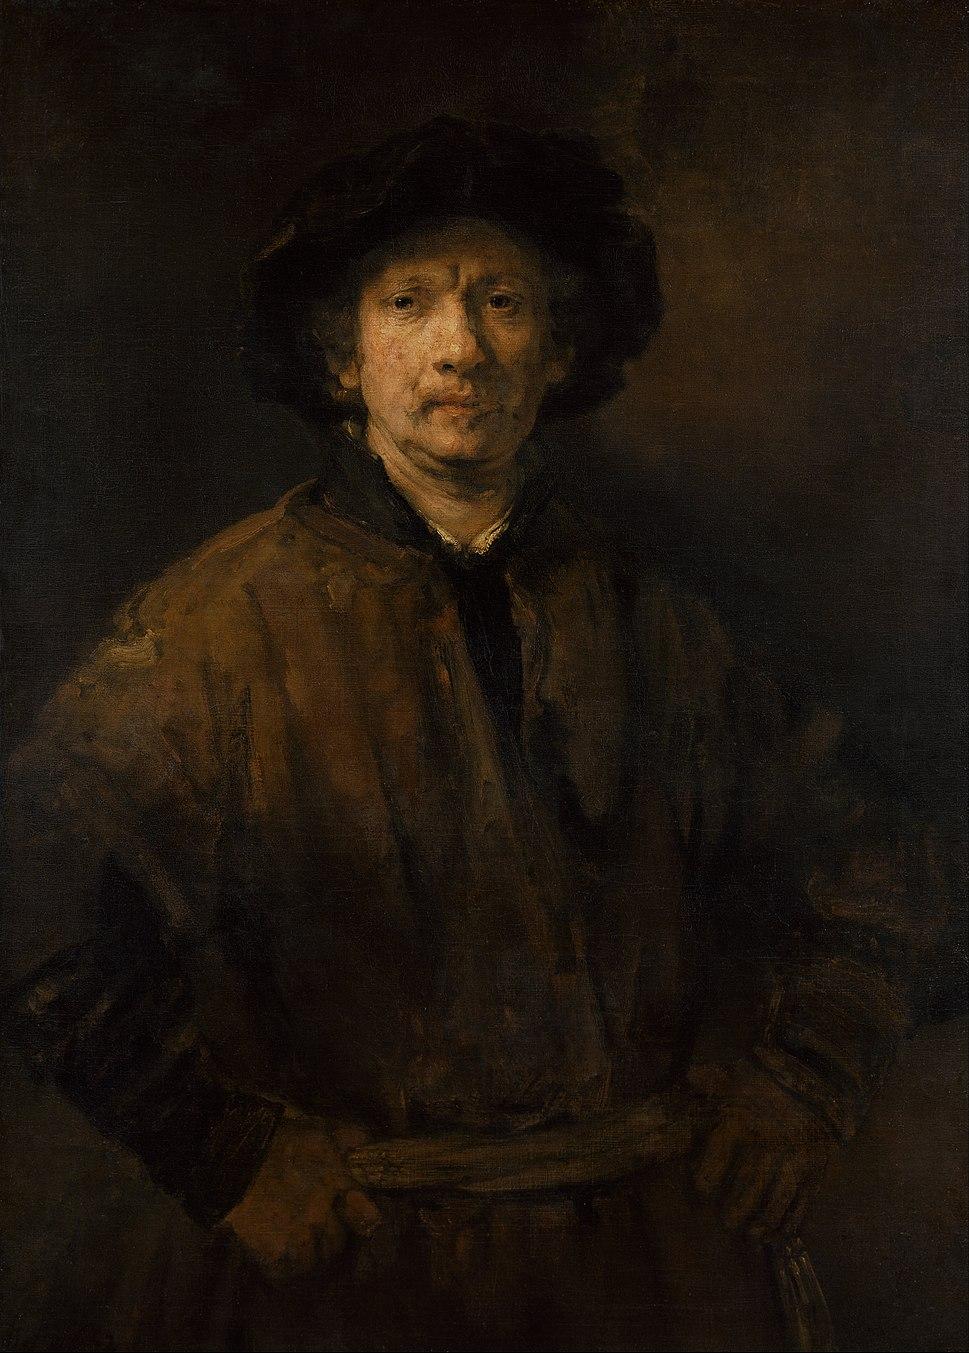 Rembrandt Harmenszoon van Rijn - Large Self-Portrait - Google Art Project